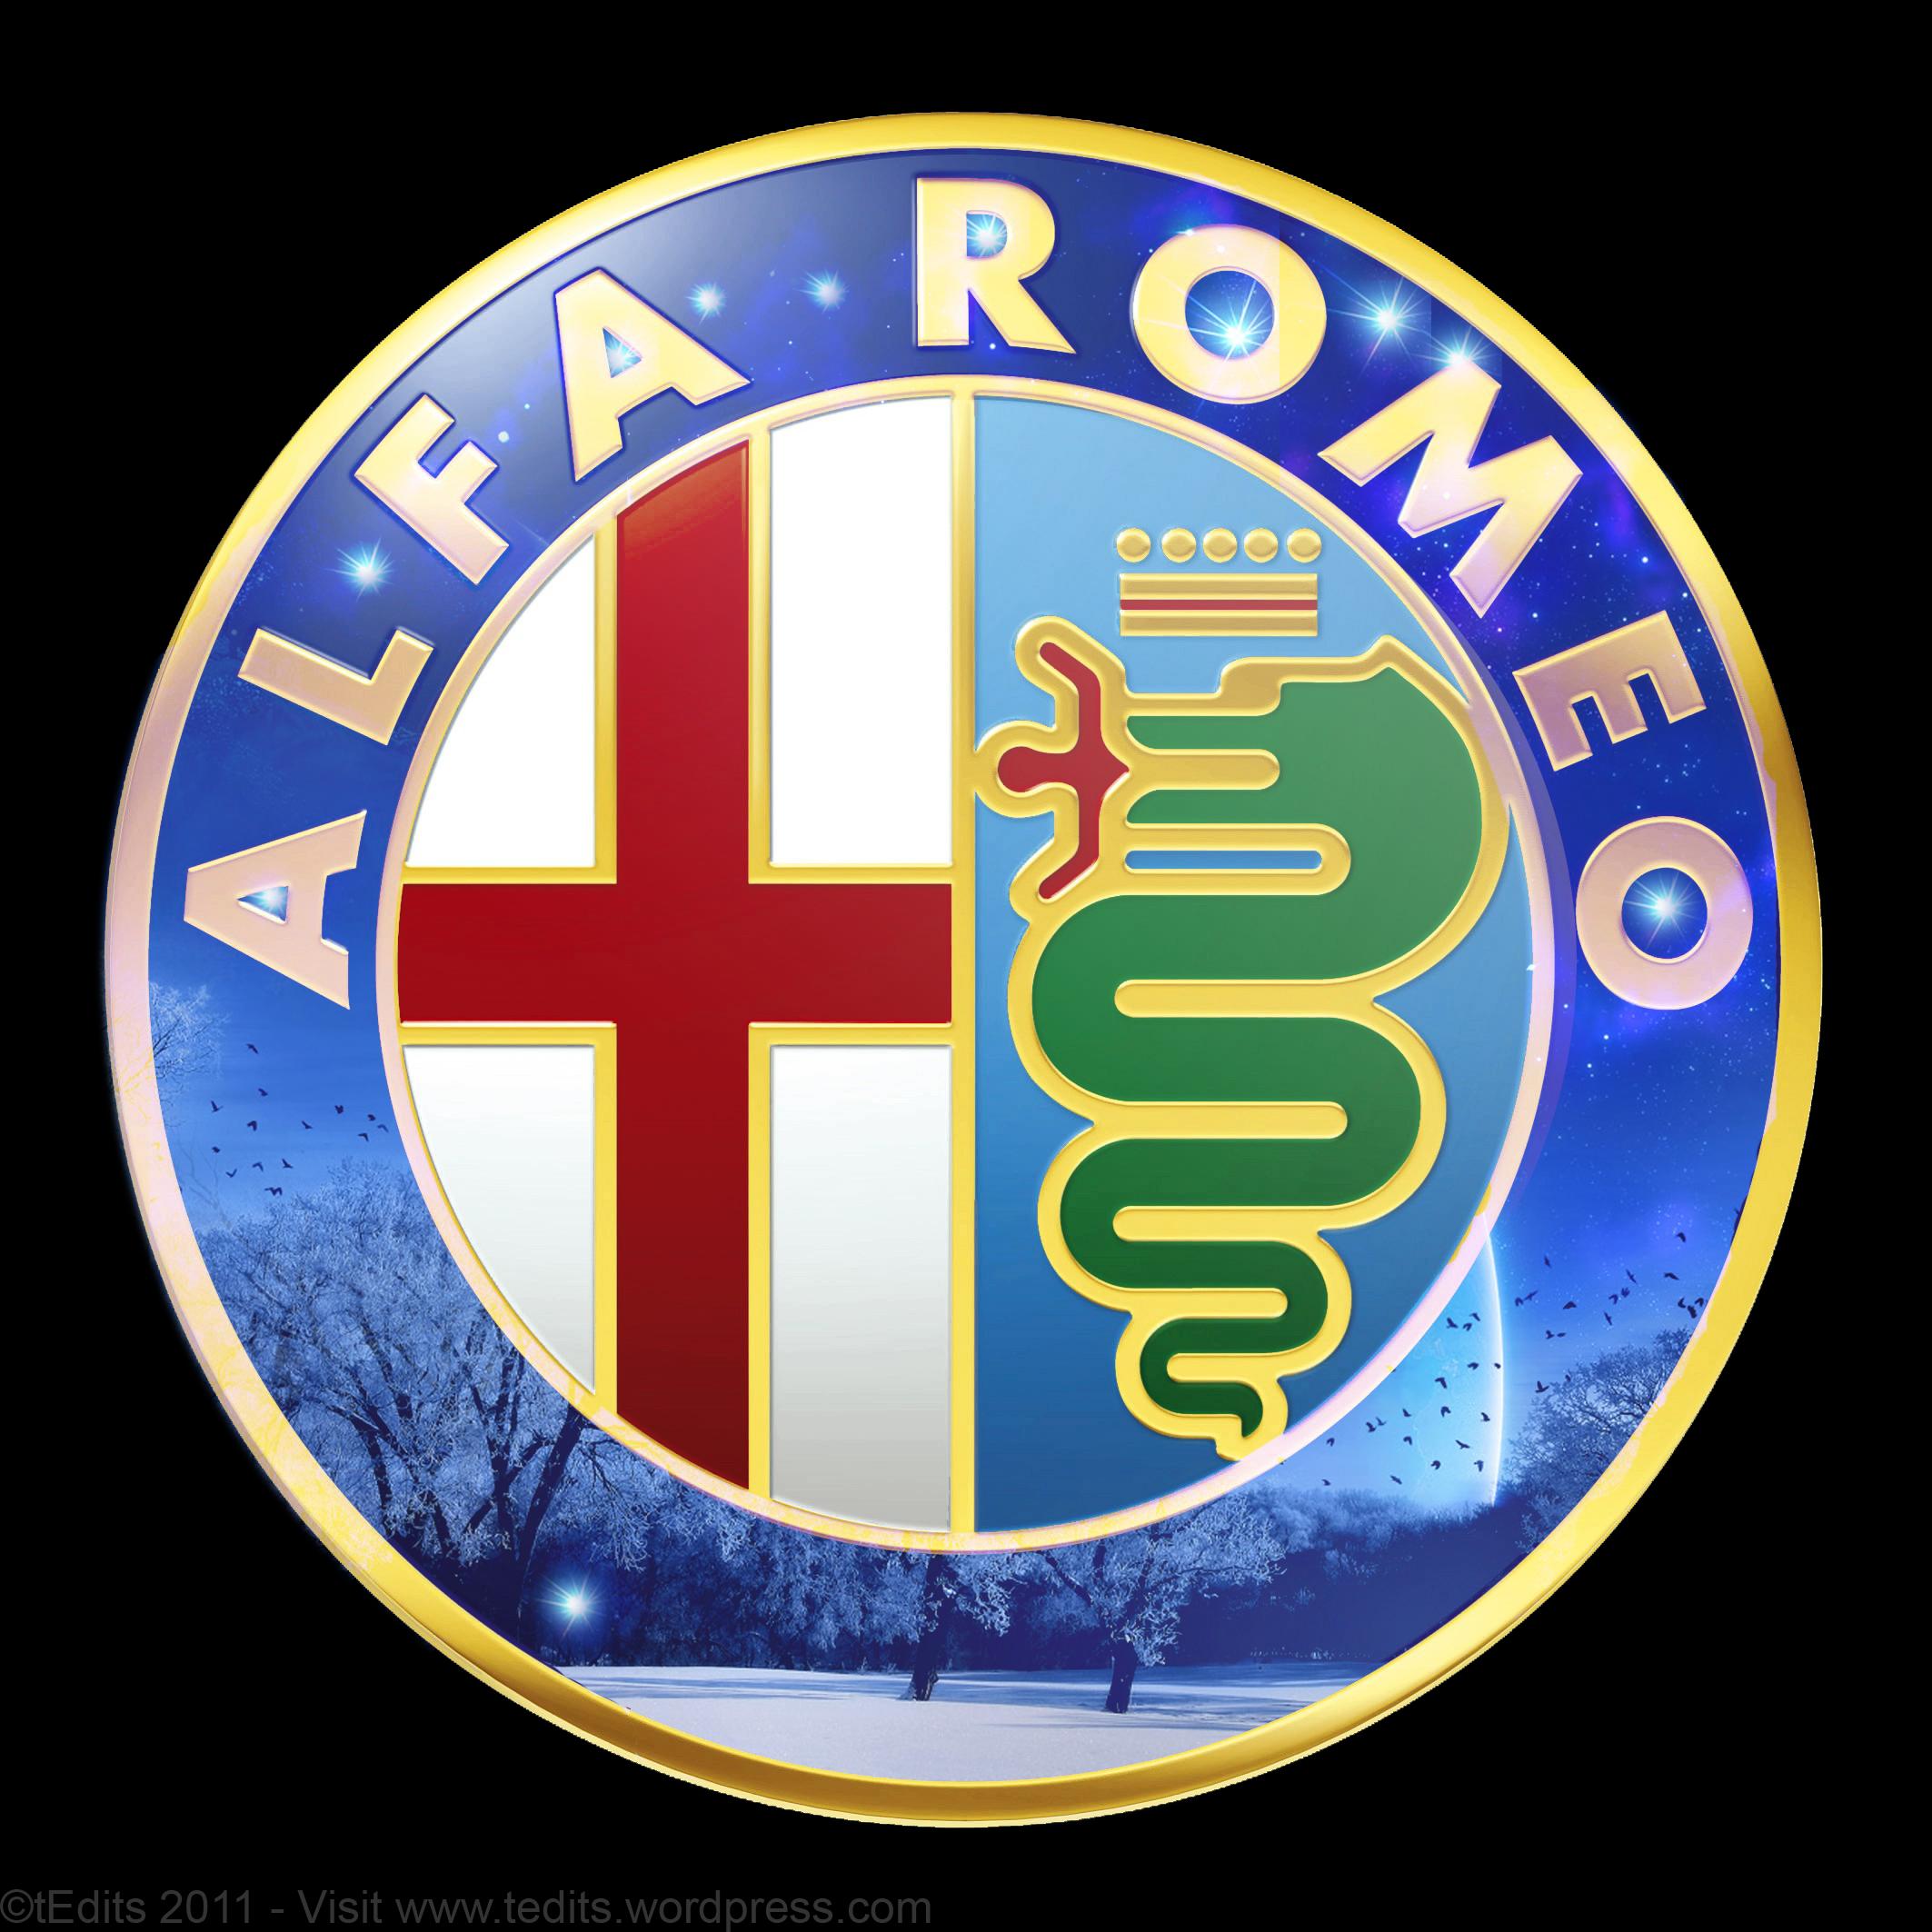 alfa romeo wallpaper logo wallpapersafari. Black Bedroom Furniture Sets. Home Design Ideas